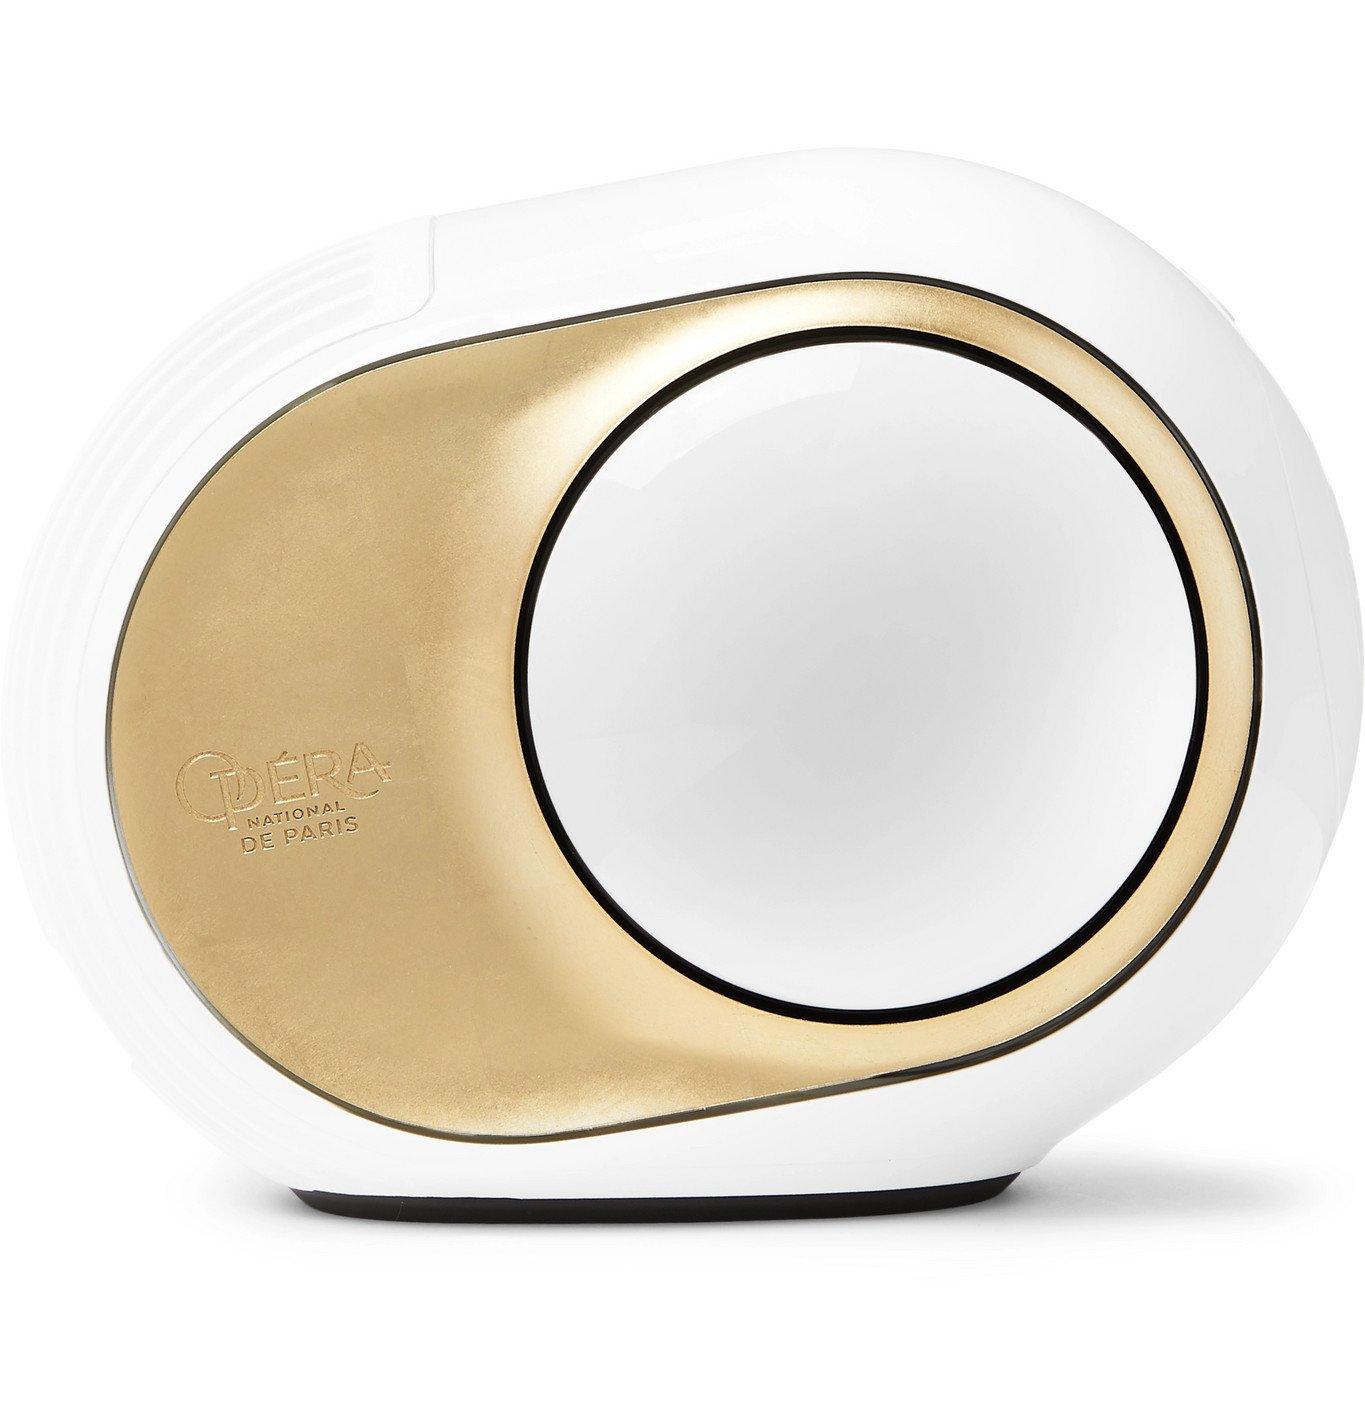 Photo: Devialet - Phantom Reactor Opéra de Paris Limited Edition Wireless Speaker - White